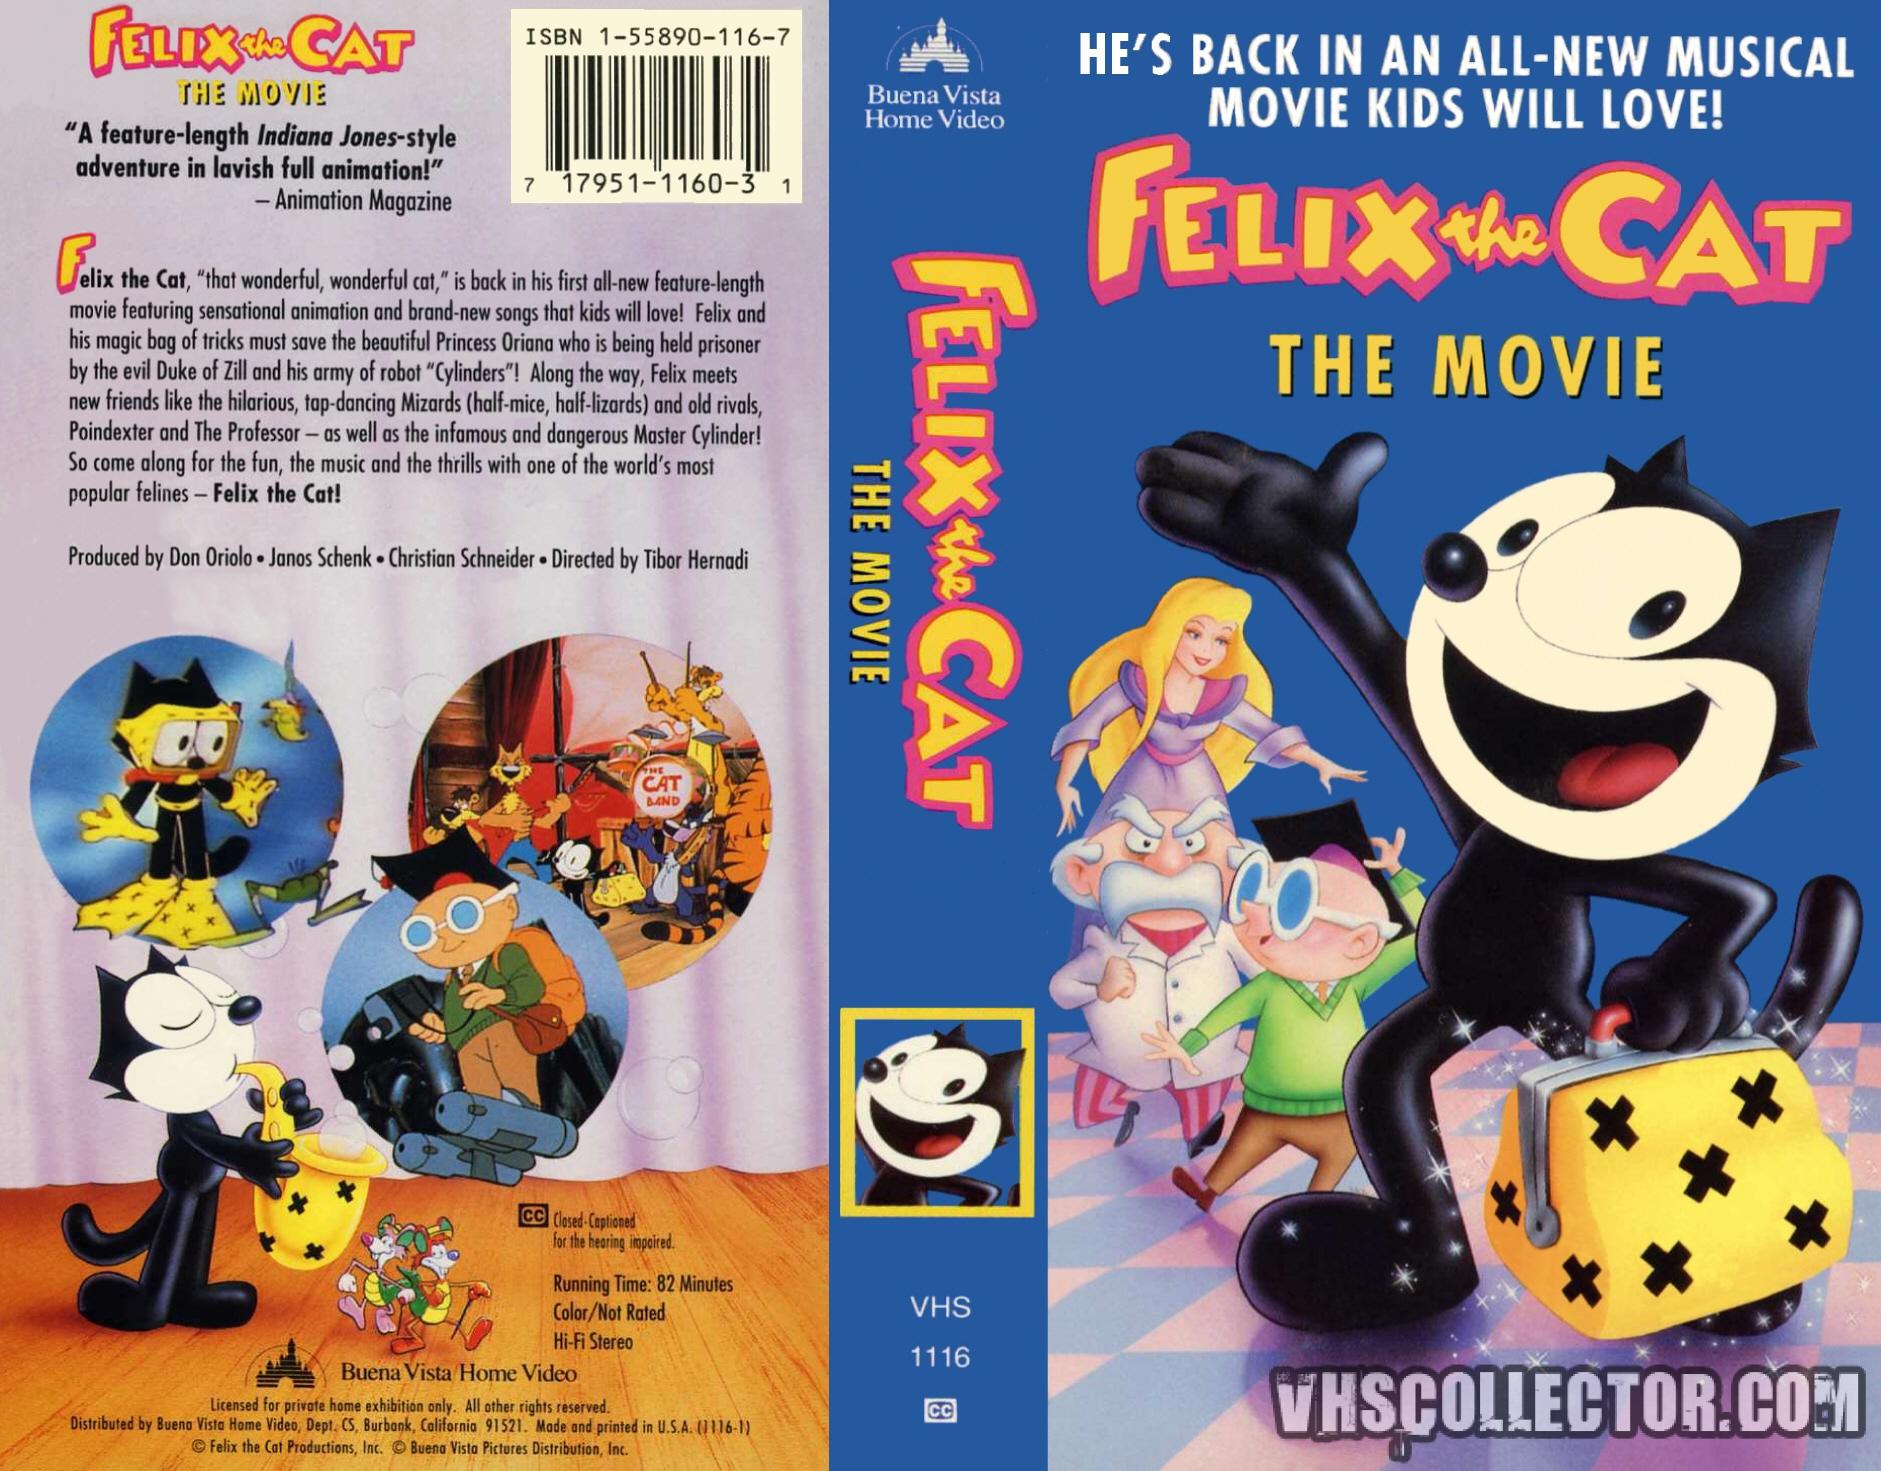 Felix the Cat: The Movie